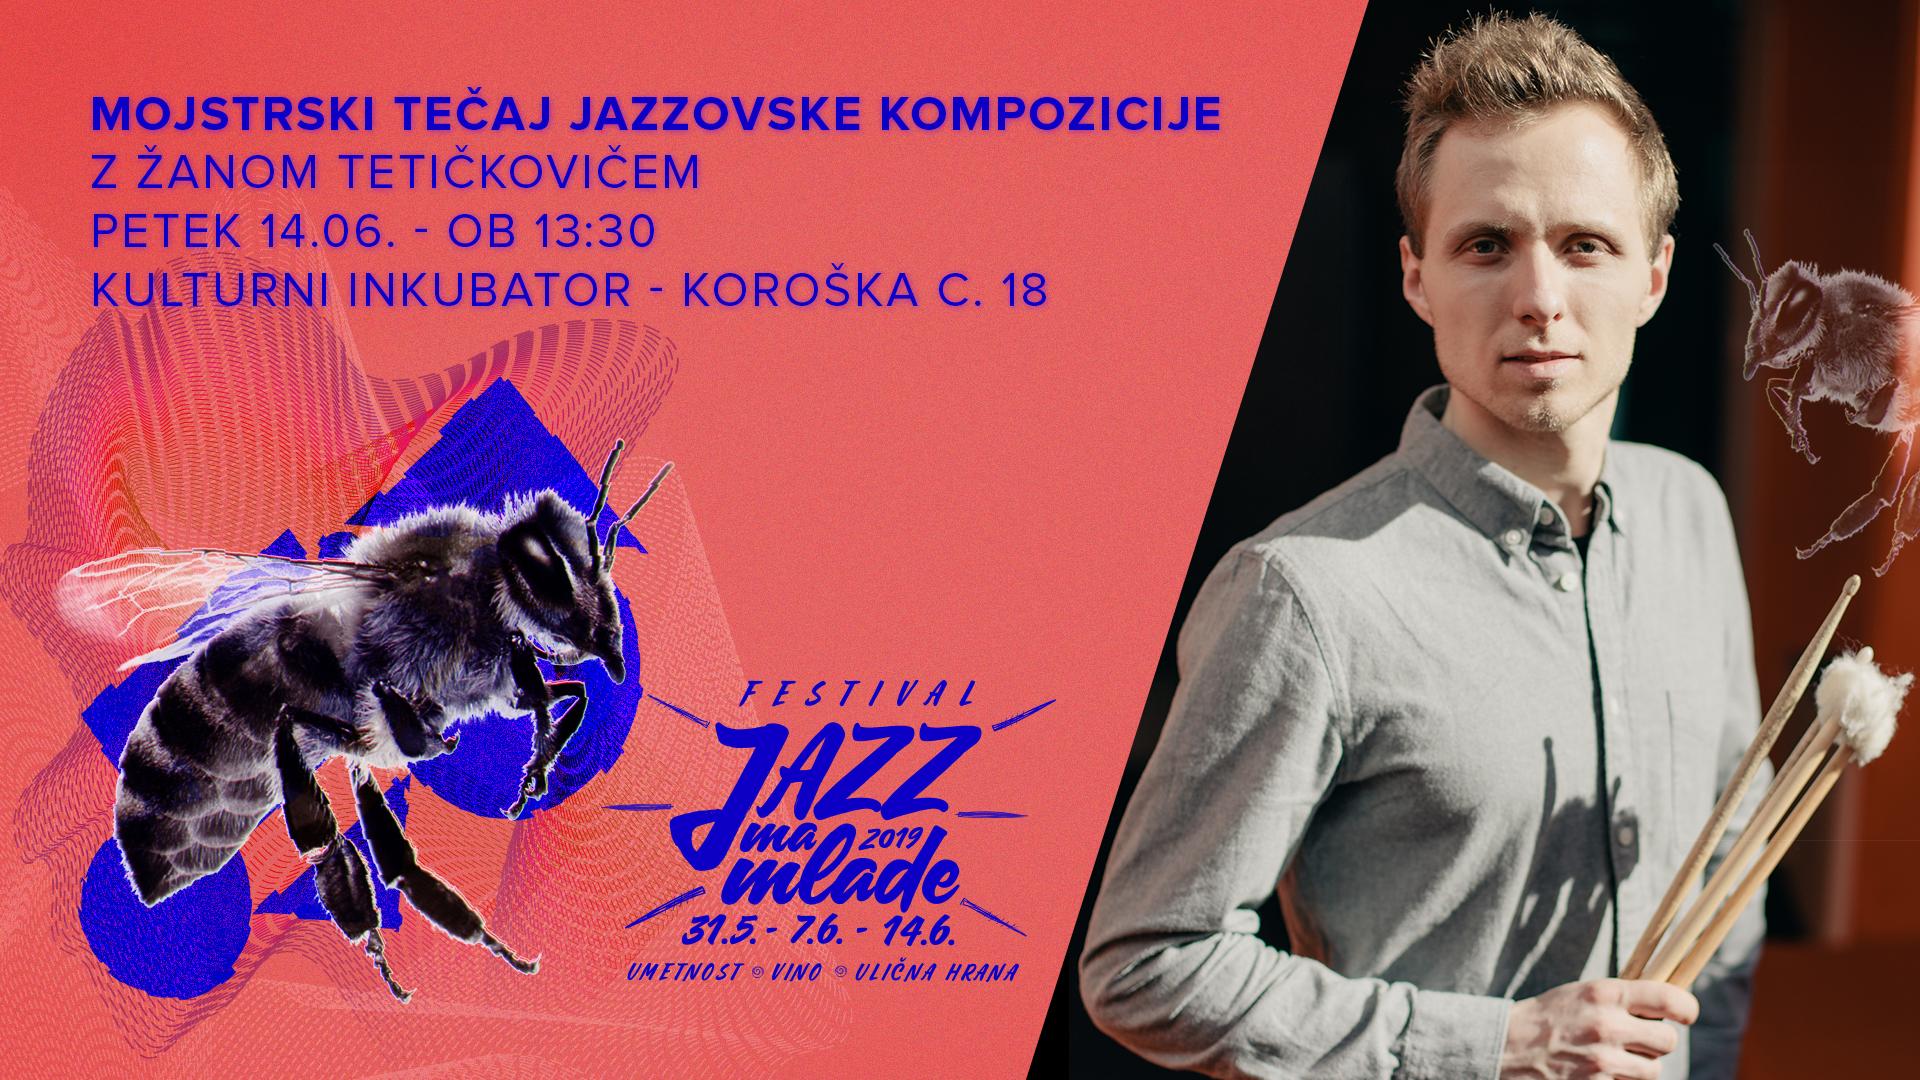 Facebook-cover-DELAVNICA-tetickovic.png